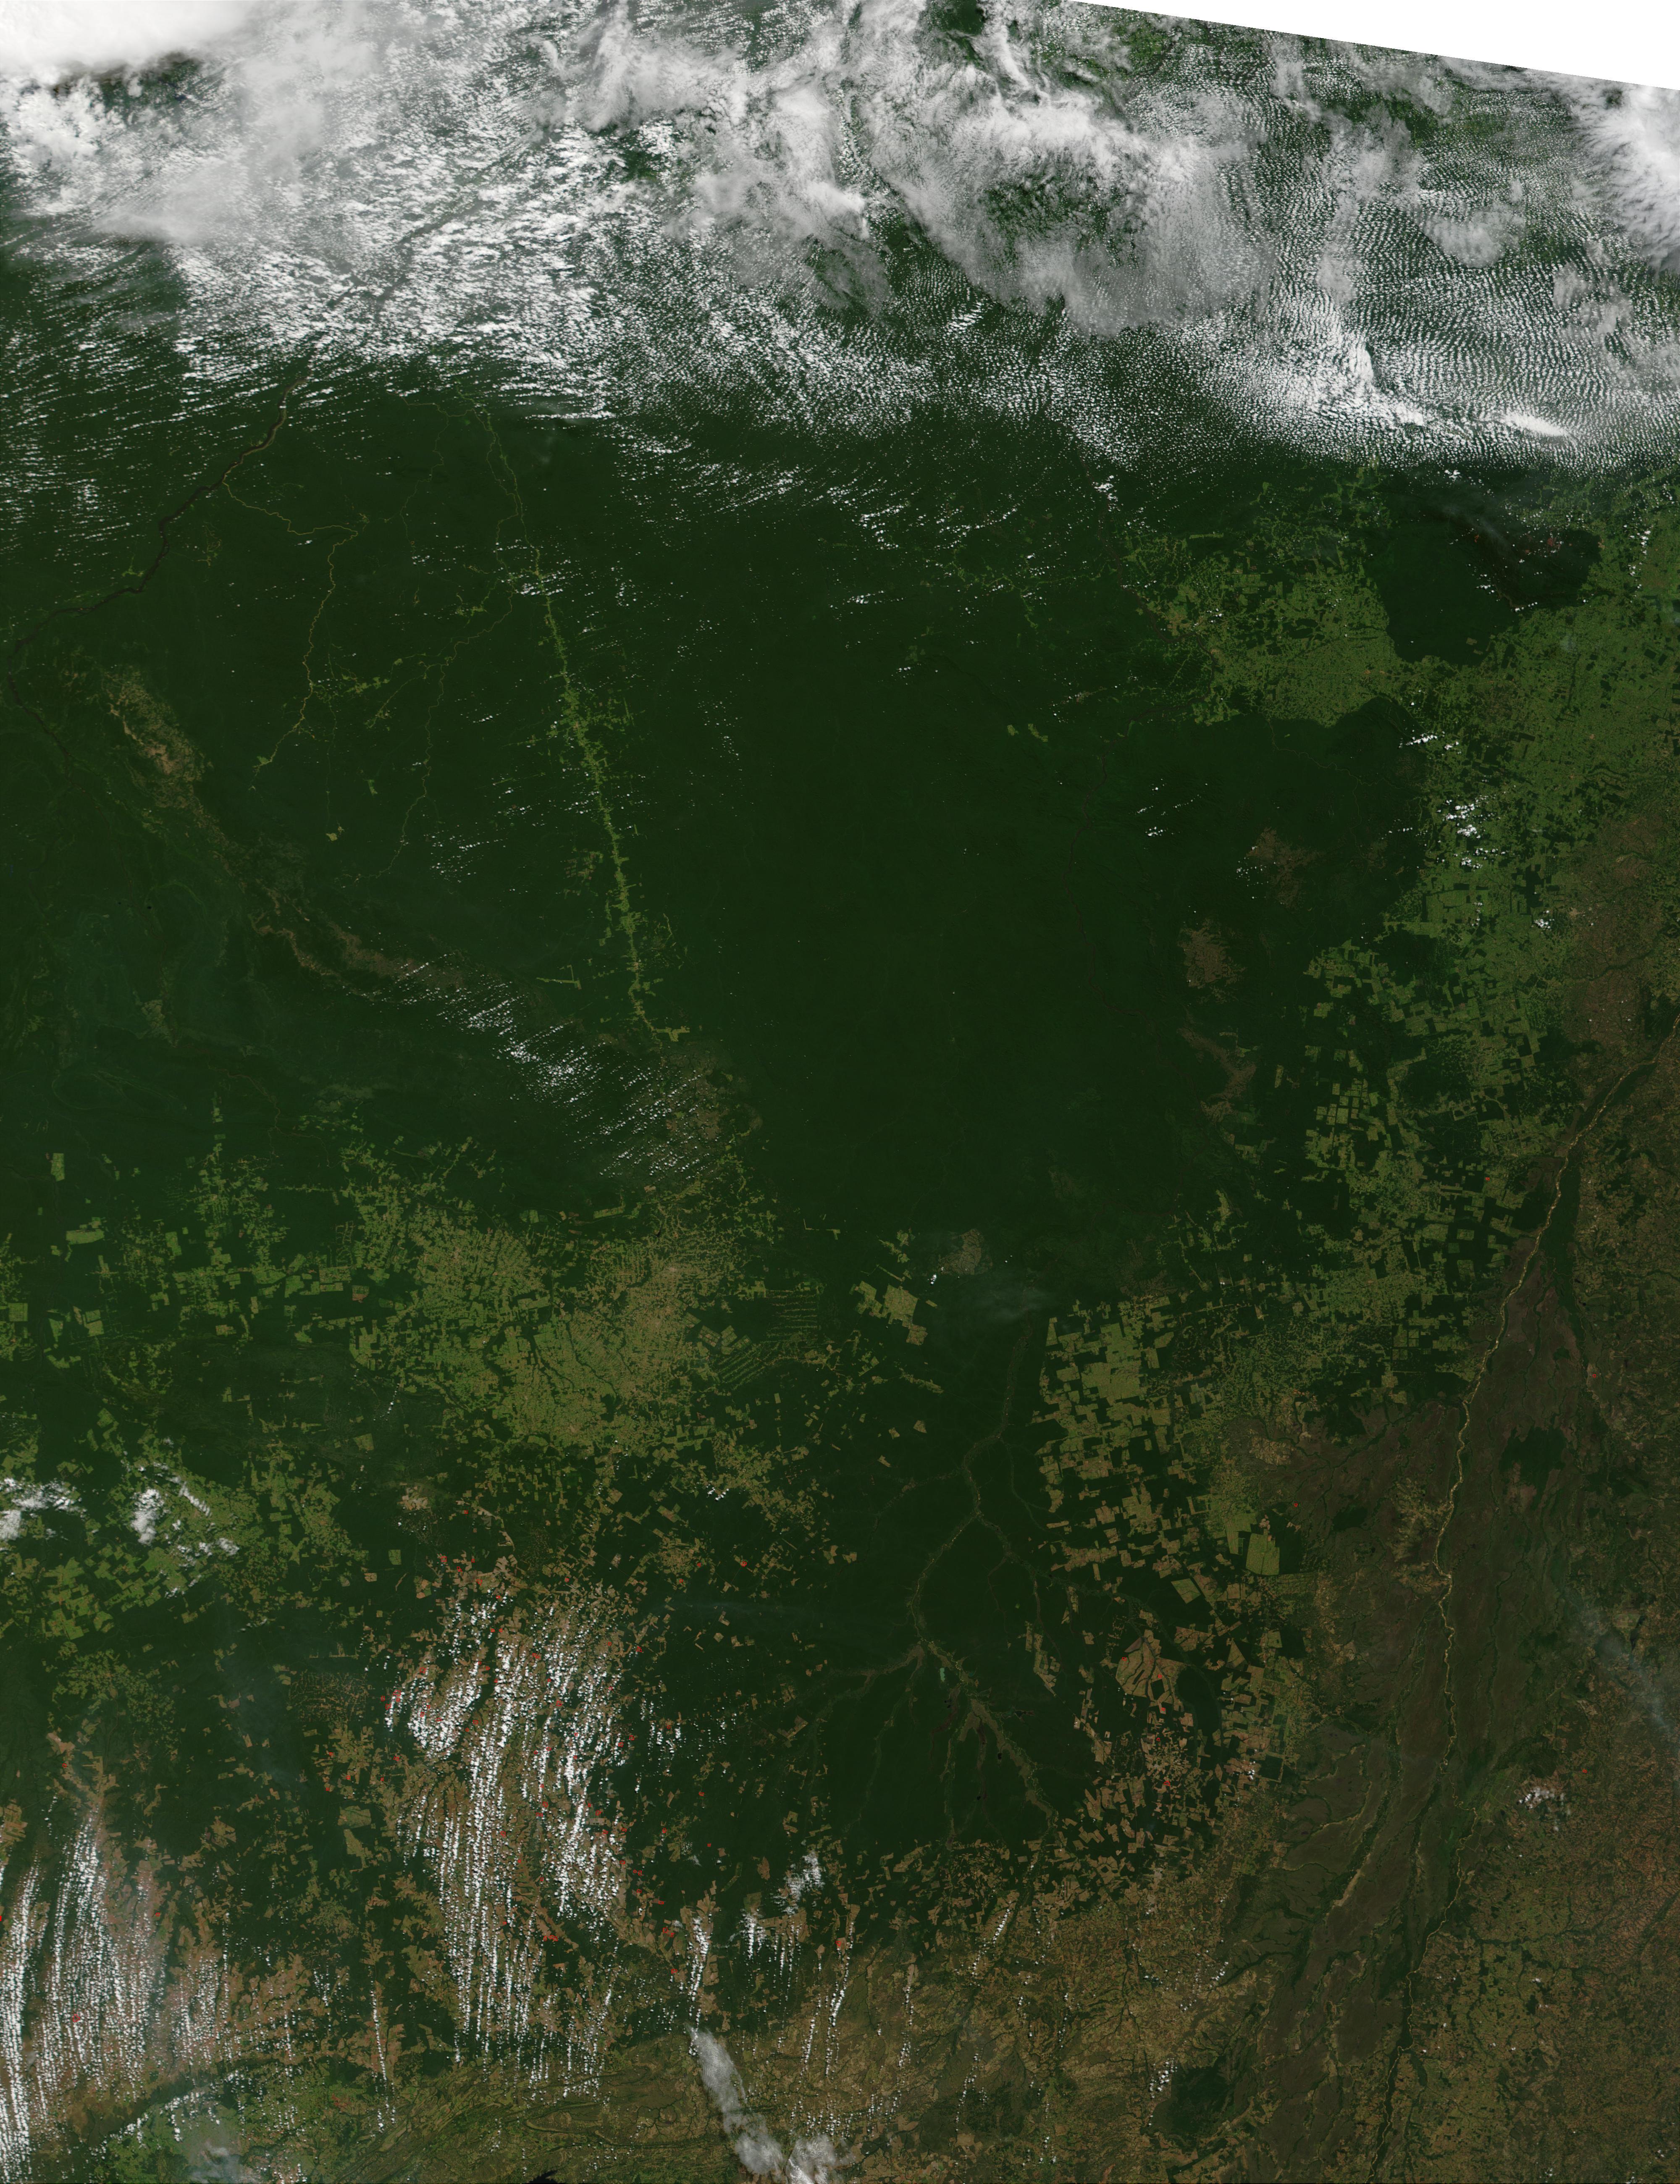 Fires in Mato Grosso State, Brazil